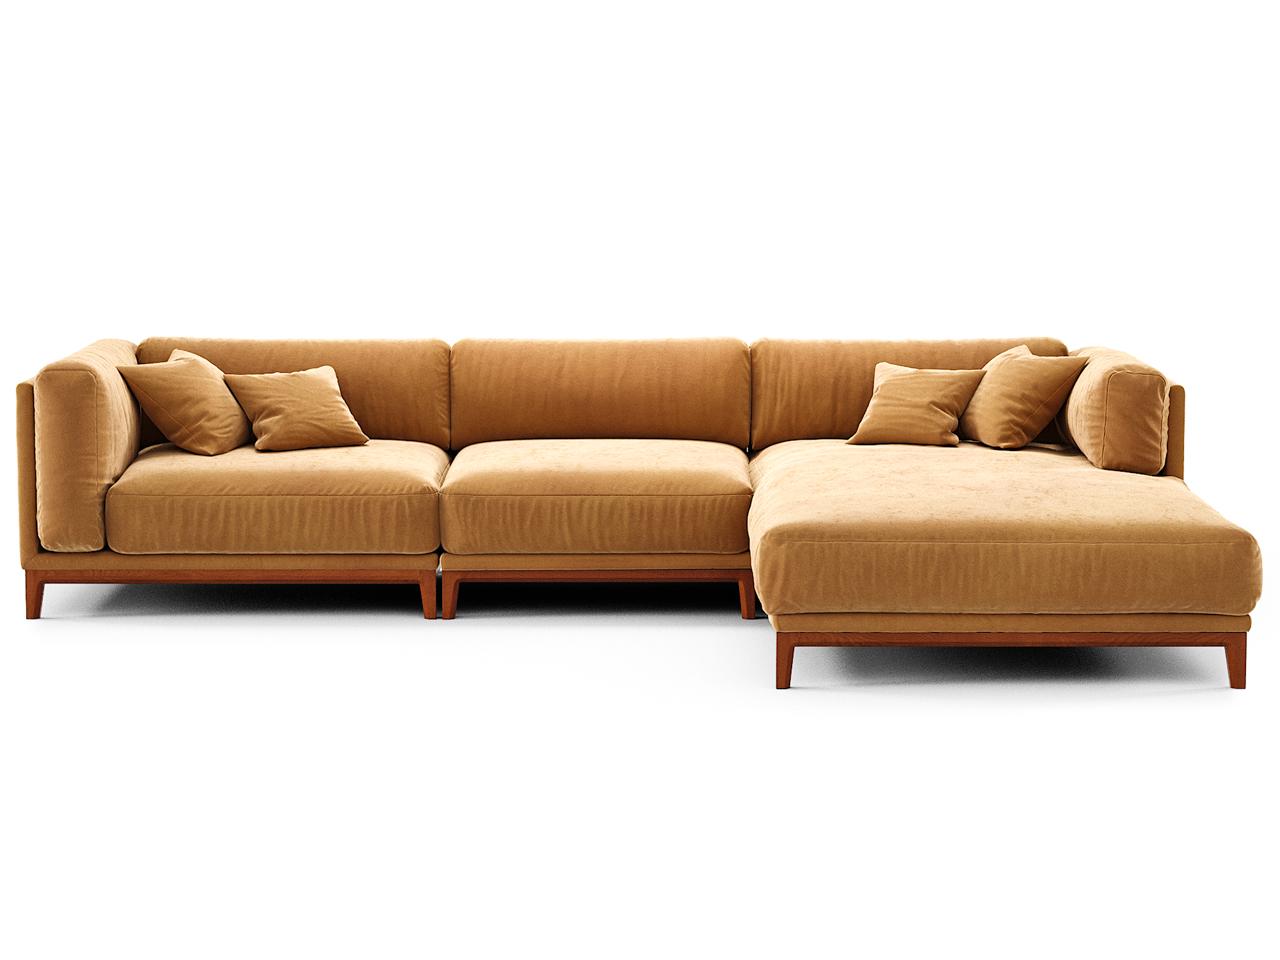 The idea диван case оранжевый 108254/2